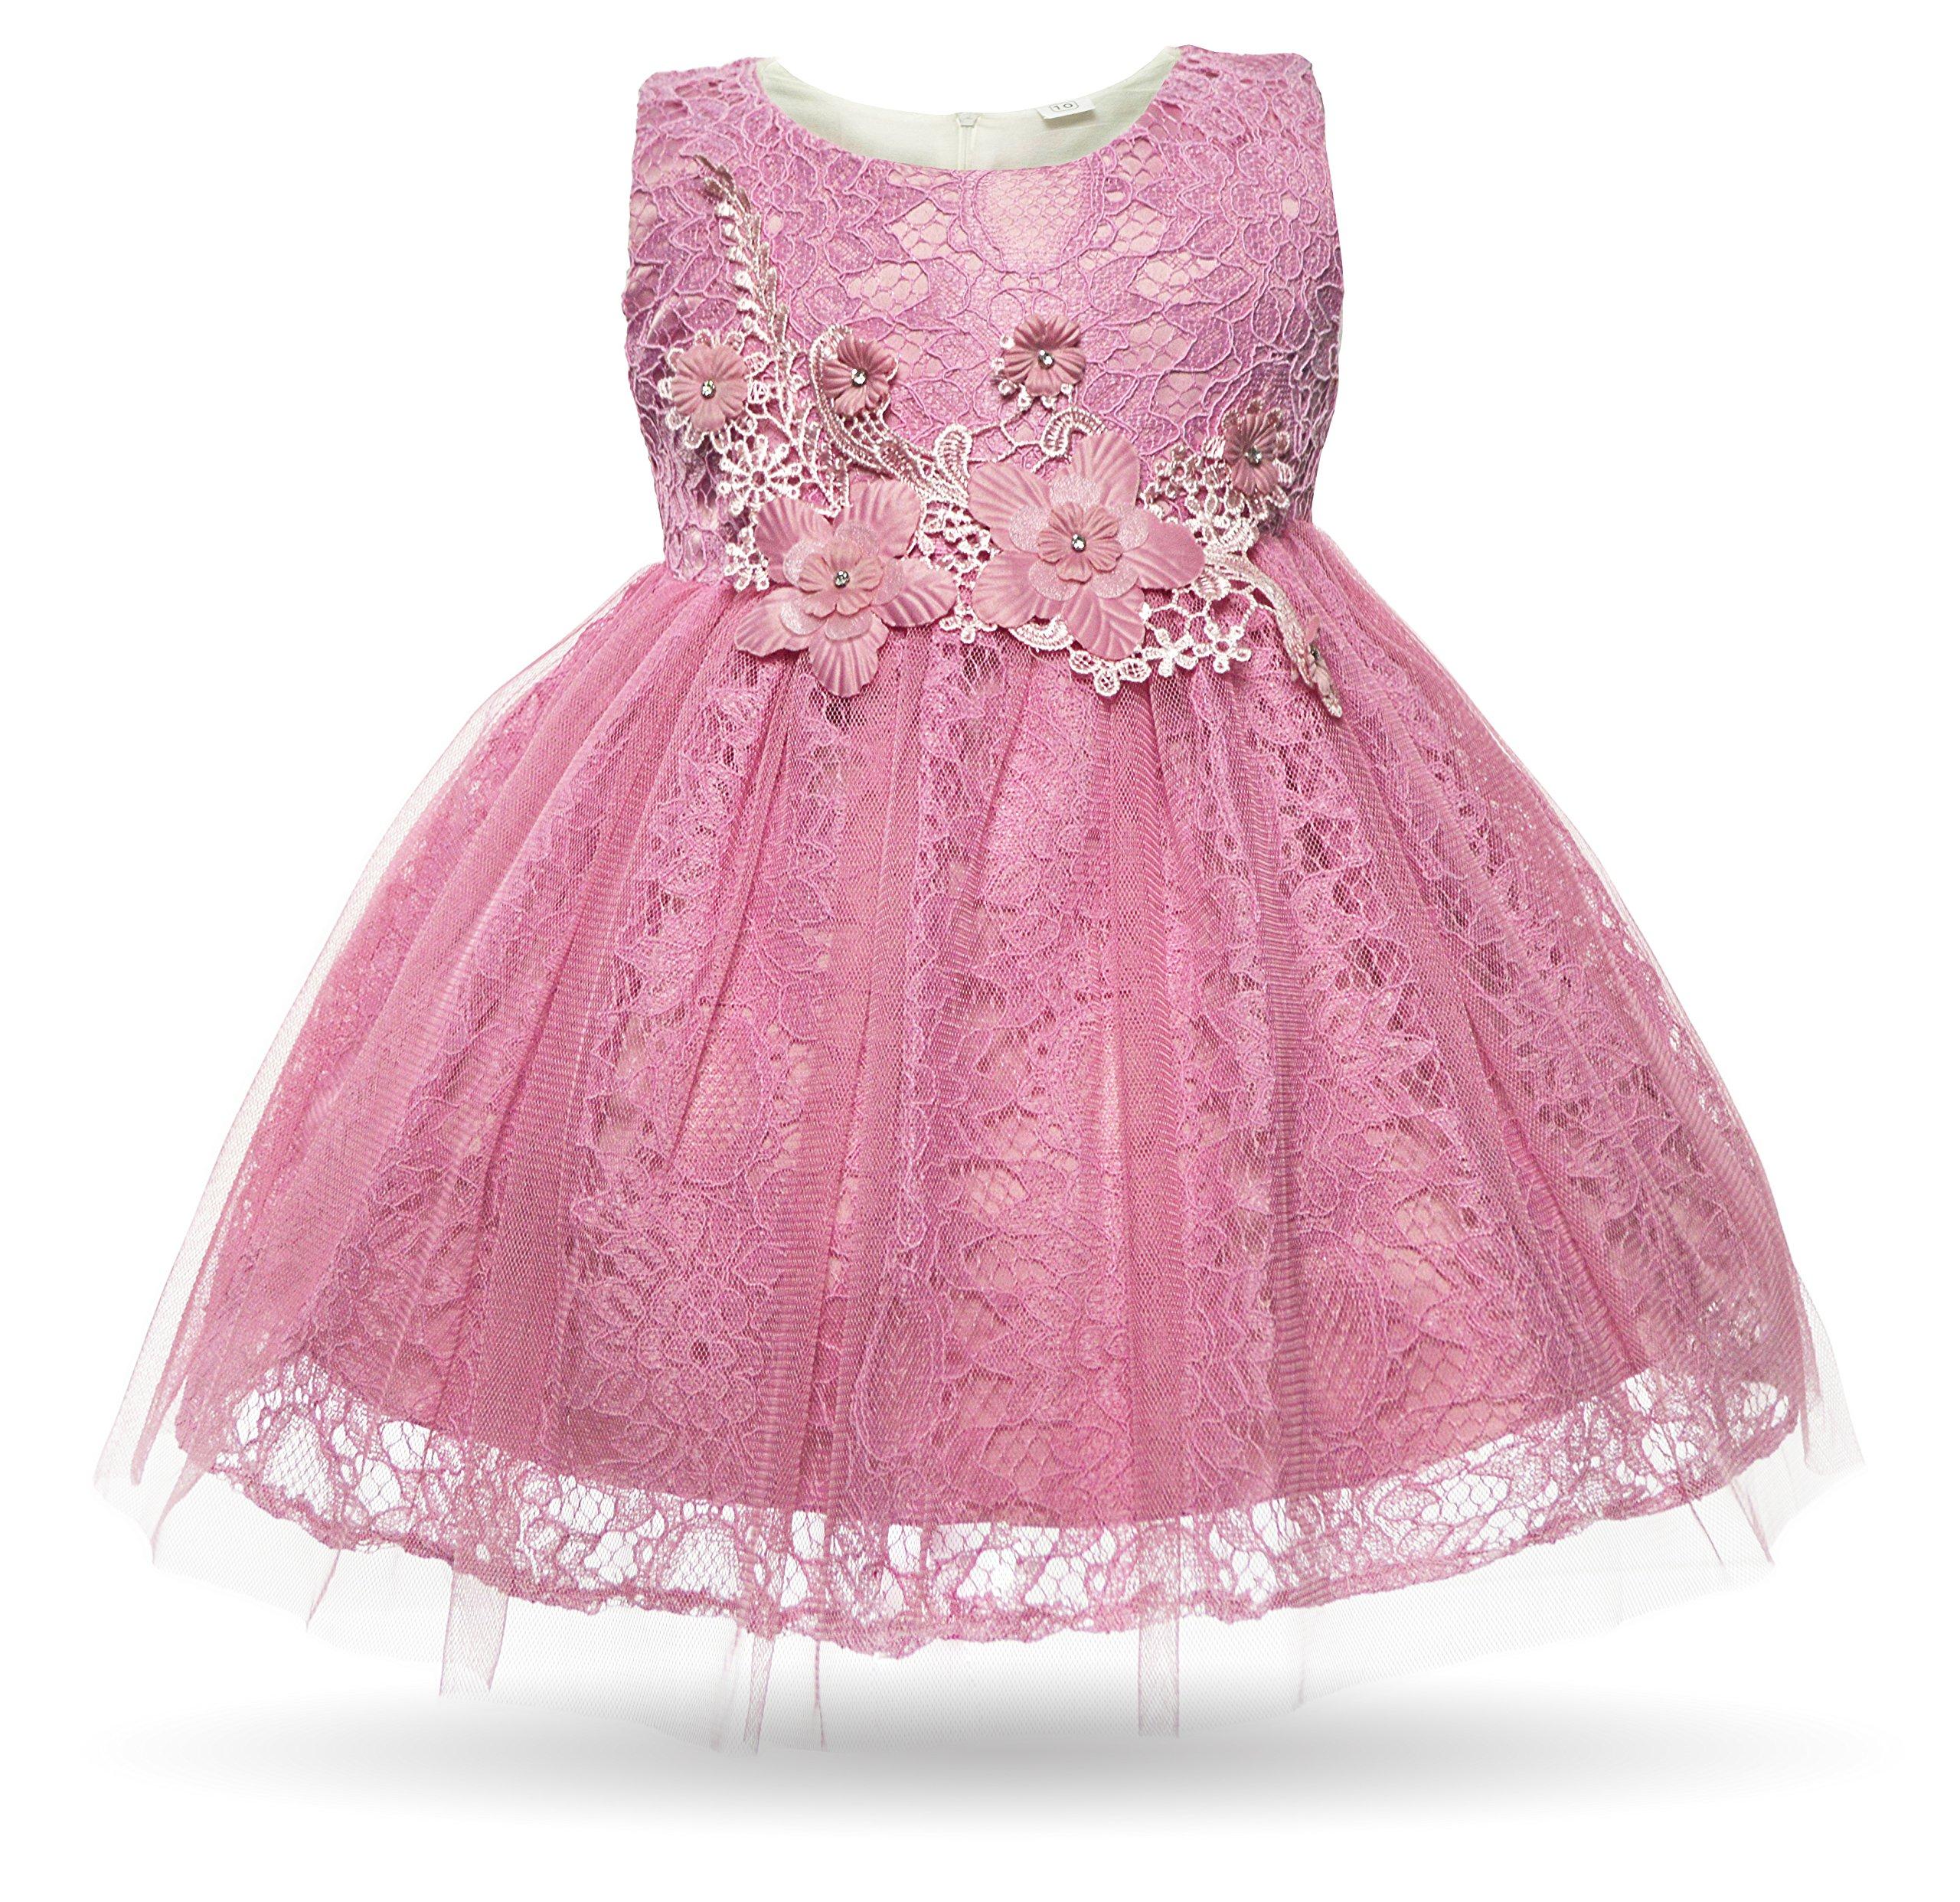 917b860c4 CIELARKO Baby Girl Dress Infant Flower Lace Wedding Party Dresses for 0-24  Months …